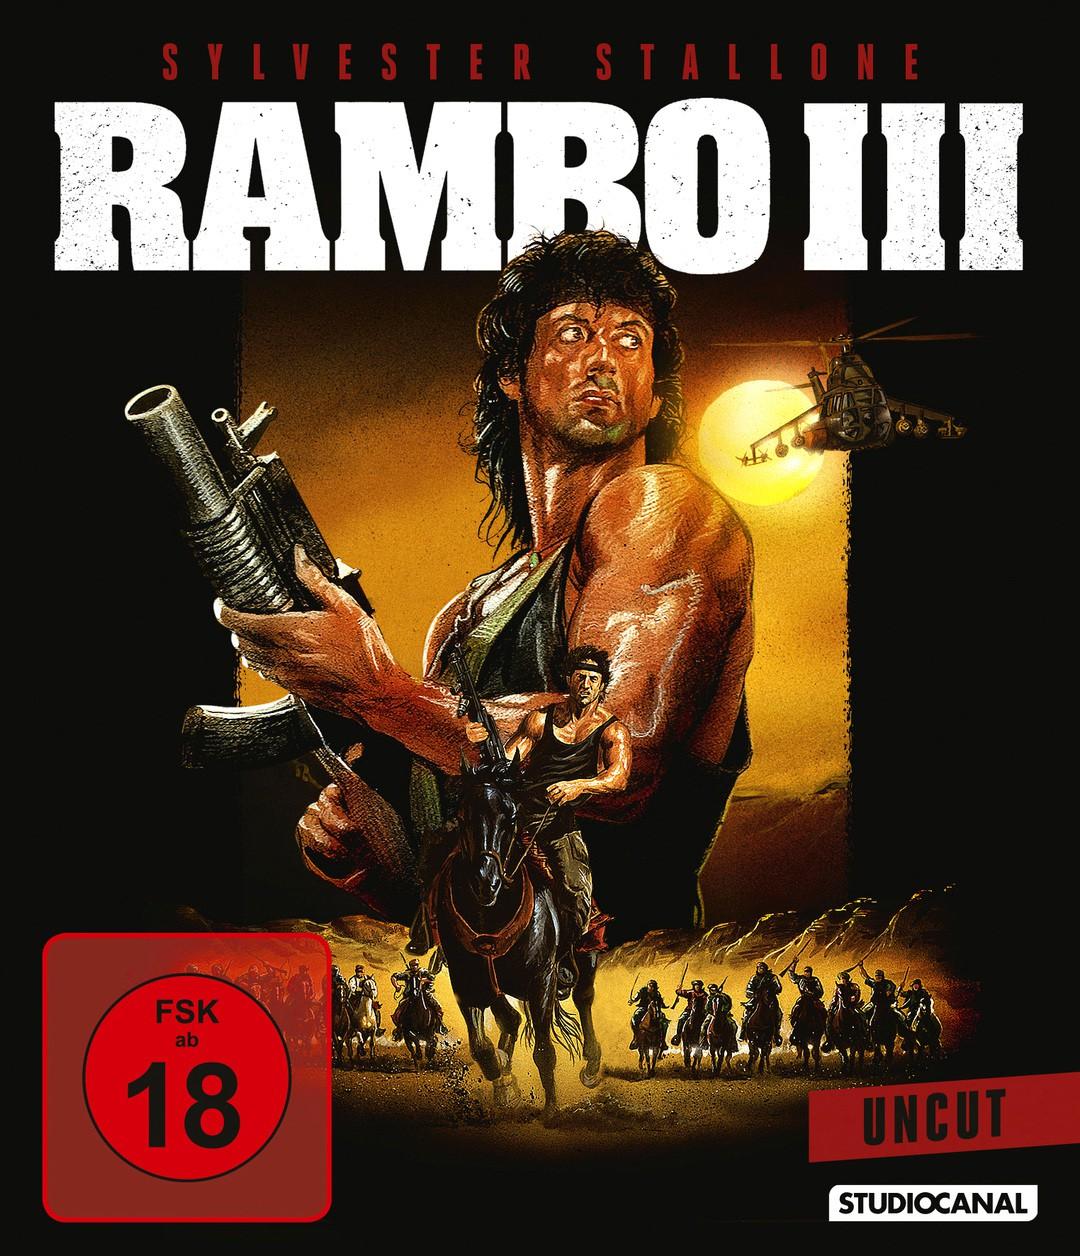 Rambo III Trailer - Bild 1 von 4